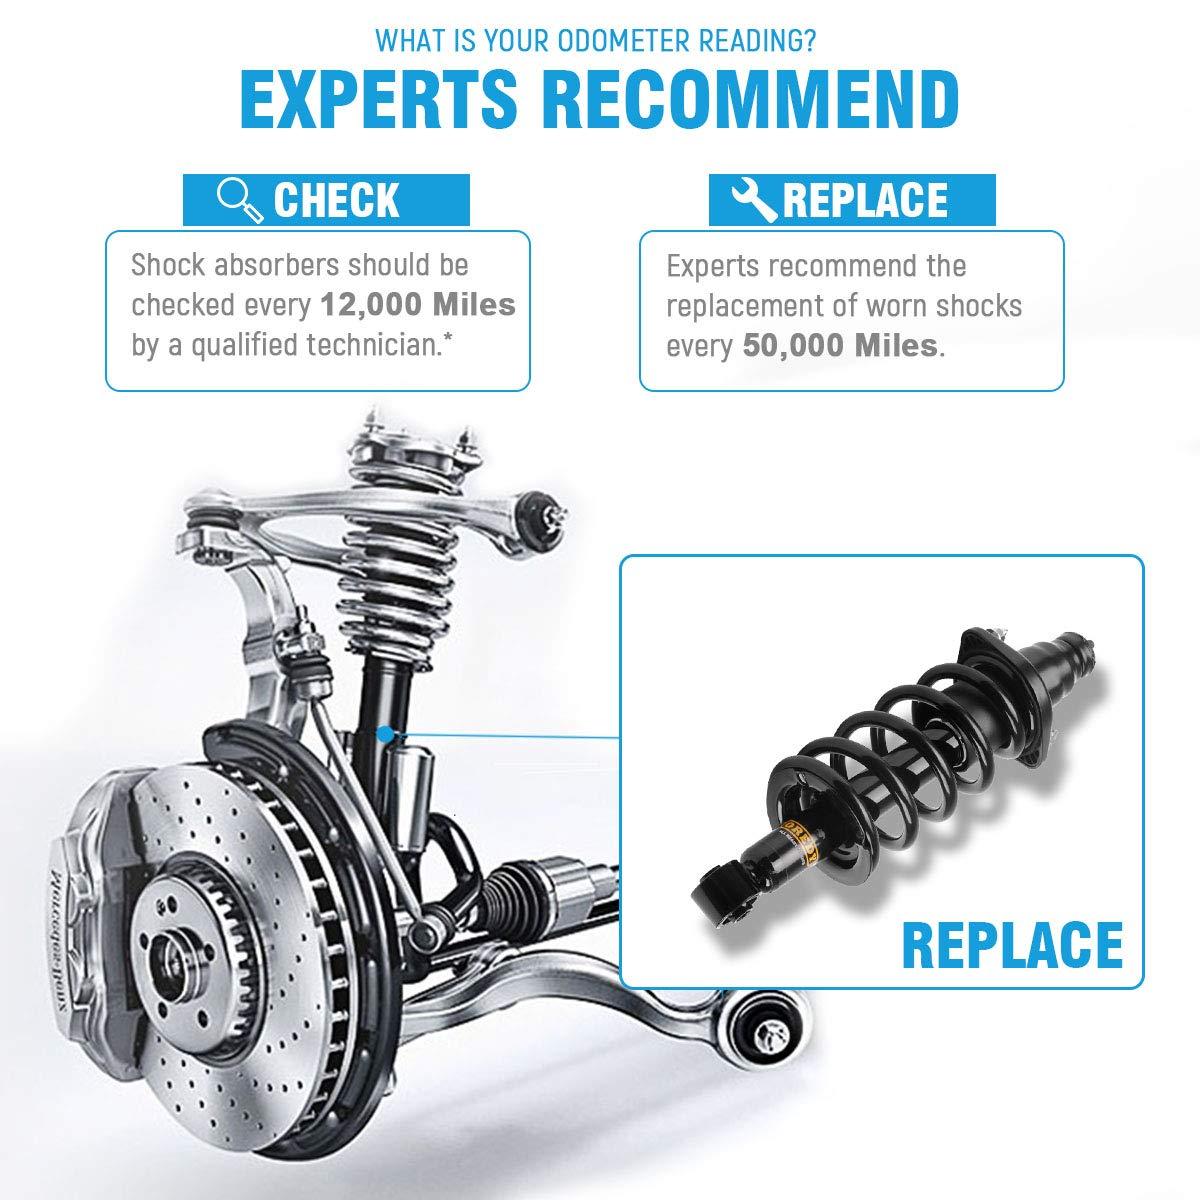 Oredy Rear Pair Complete Quick Struts Shock Coil Spring 2003 Honda Cr V Suspension Parts Diagram 1997 Front Assembly Kit Xs822135821 171380r 171380l 15146 15145 Sr4193 Sr4194 Compatible With 2002 2004 2005 2006 Automotive